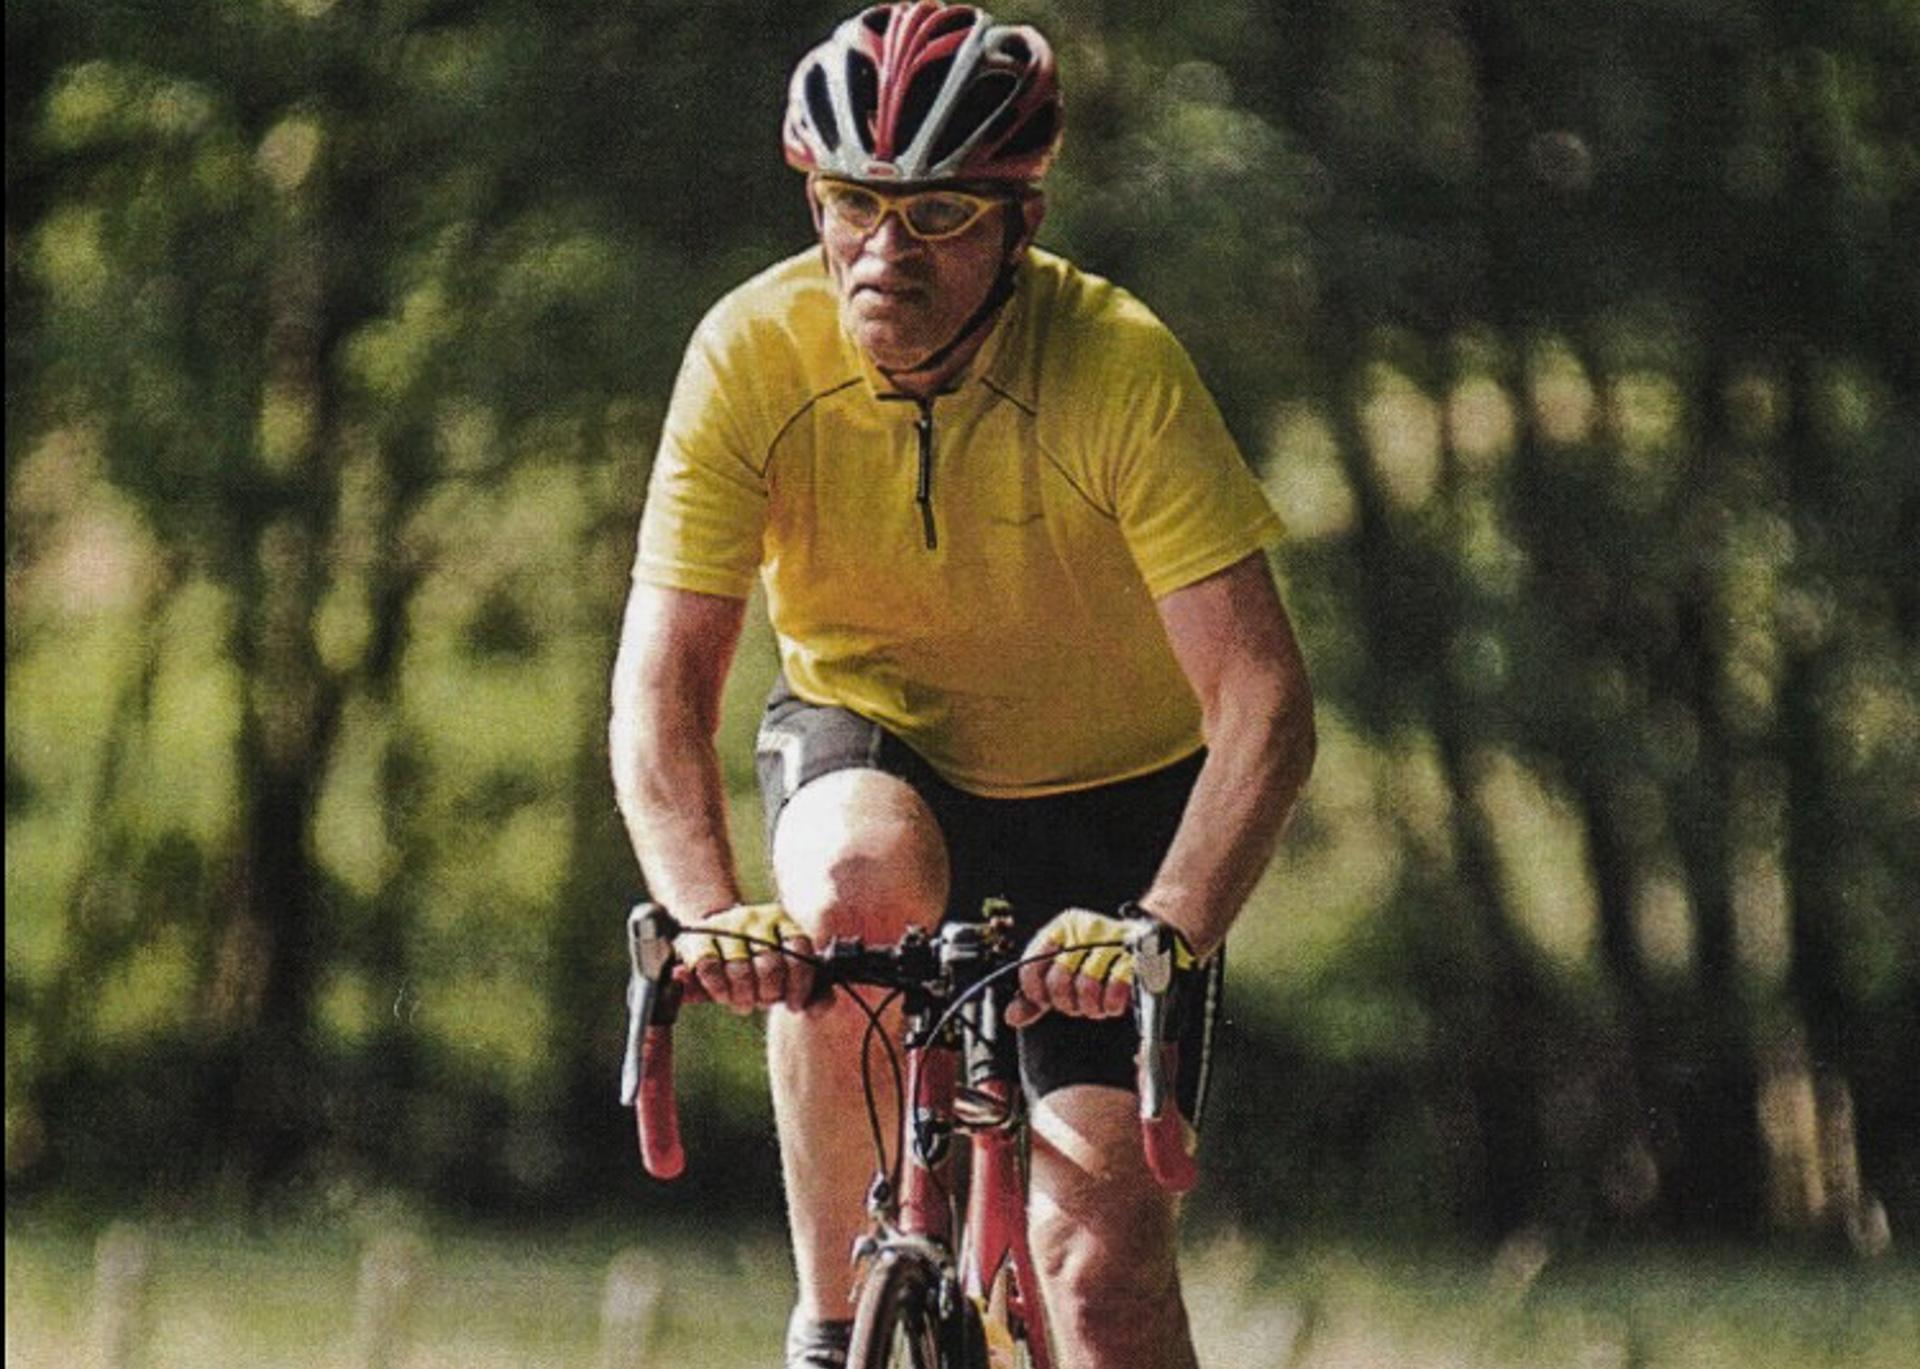 Frank-Simons-yellow-shirt-red-bike-2017-transcontinentalrace06